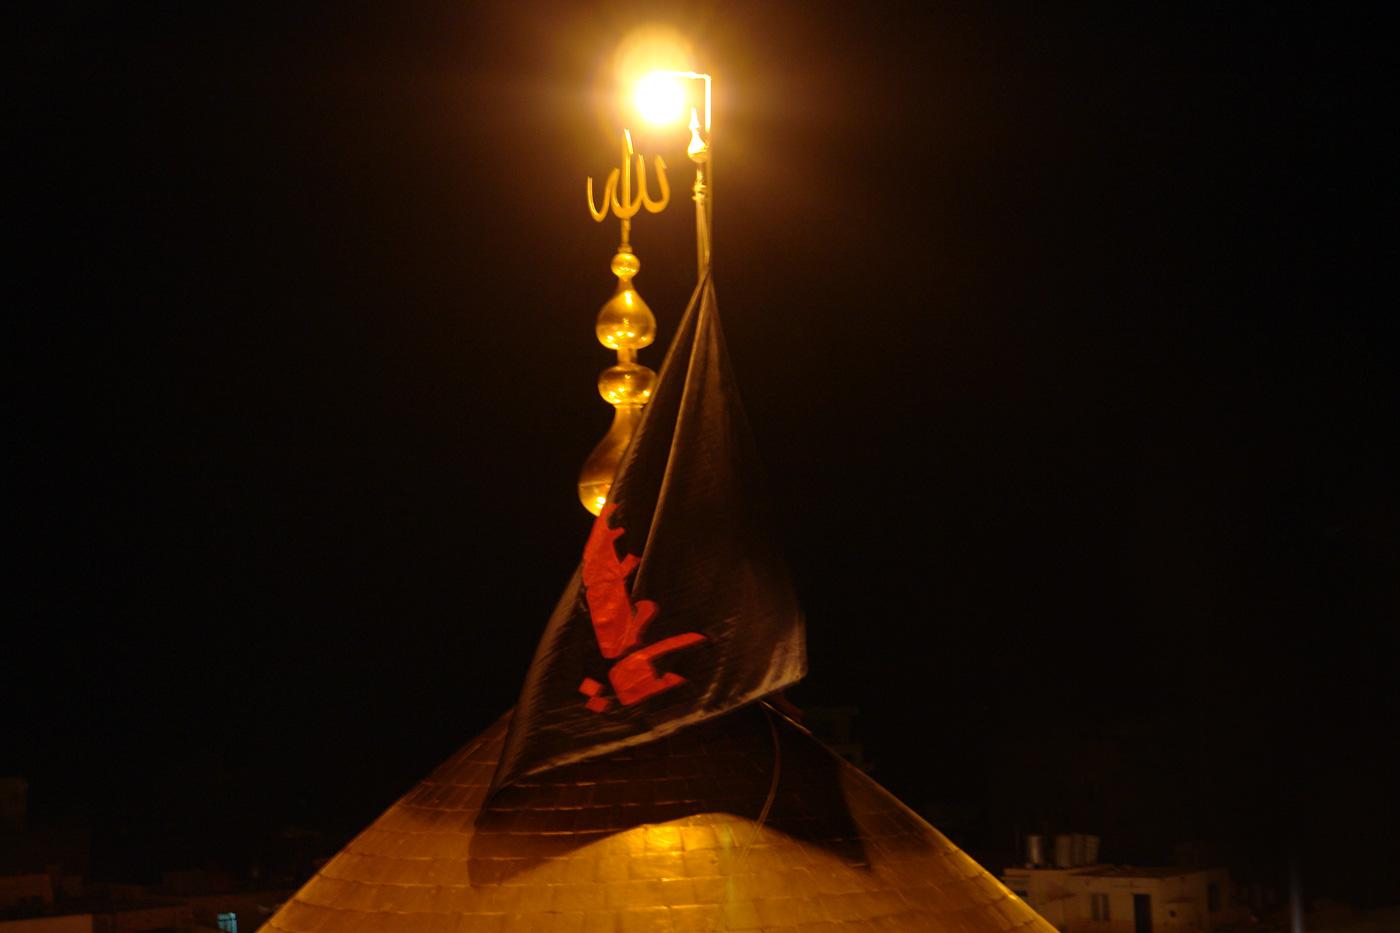 Karbala Alamto.Com 002 عکس های بسیار زیبا از حرم امام حسین عکس